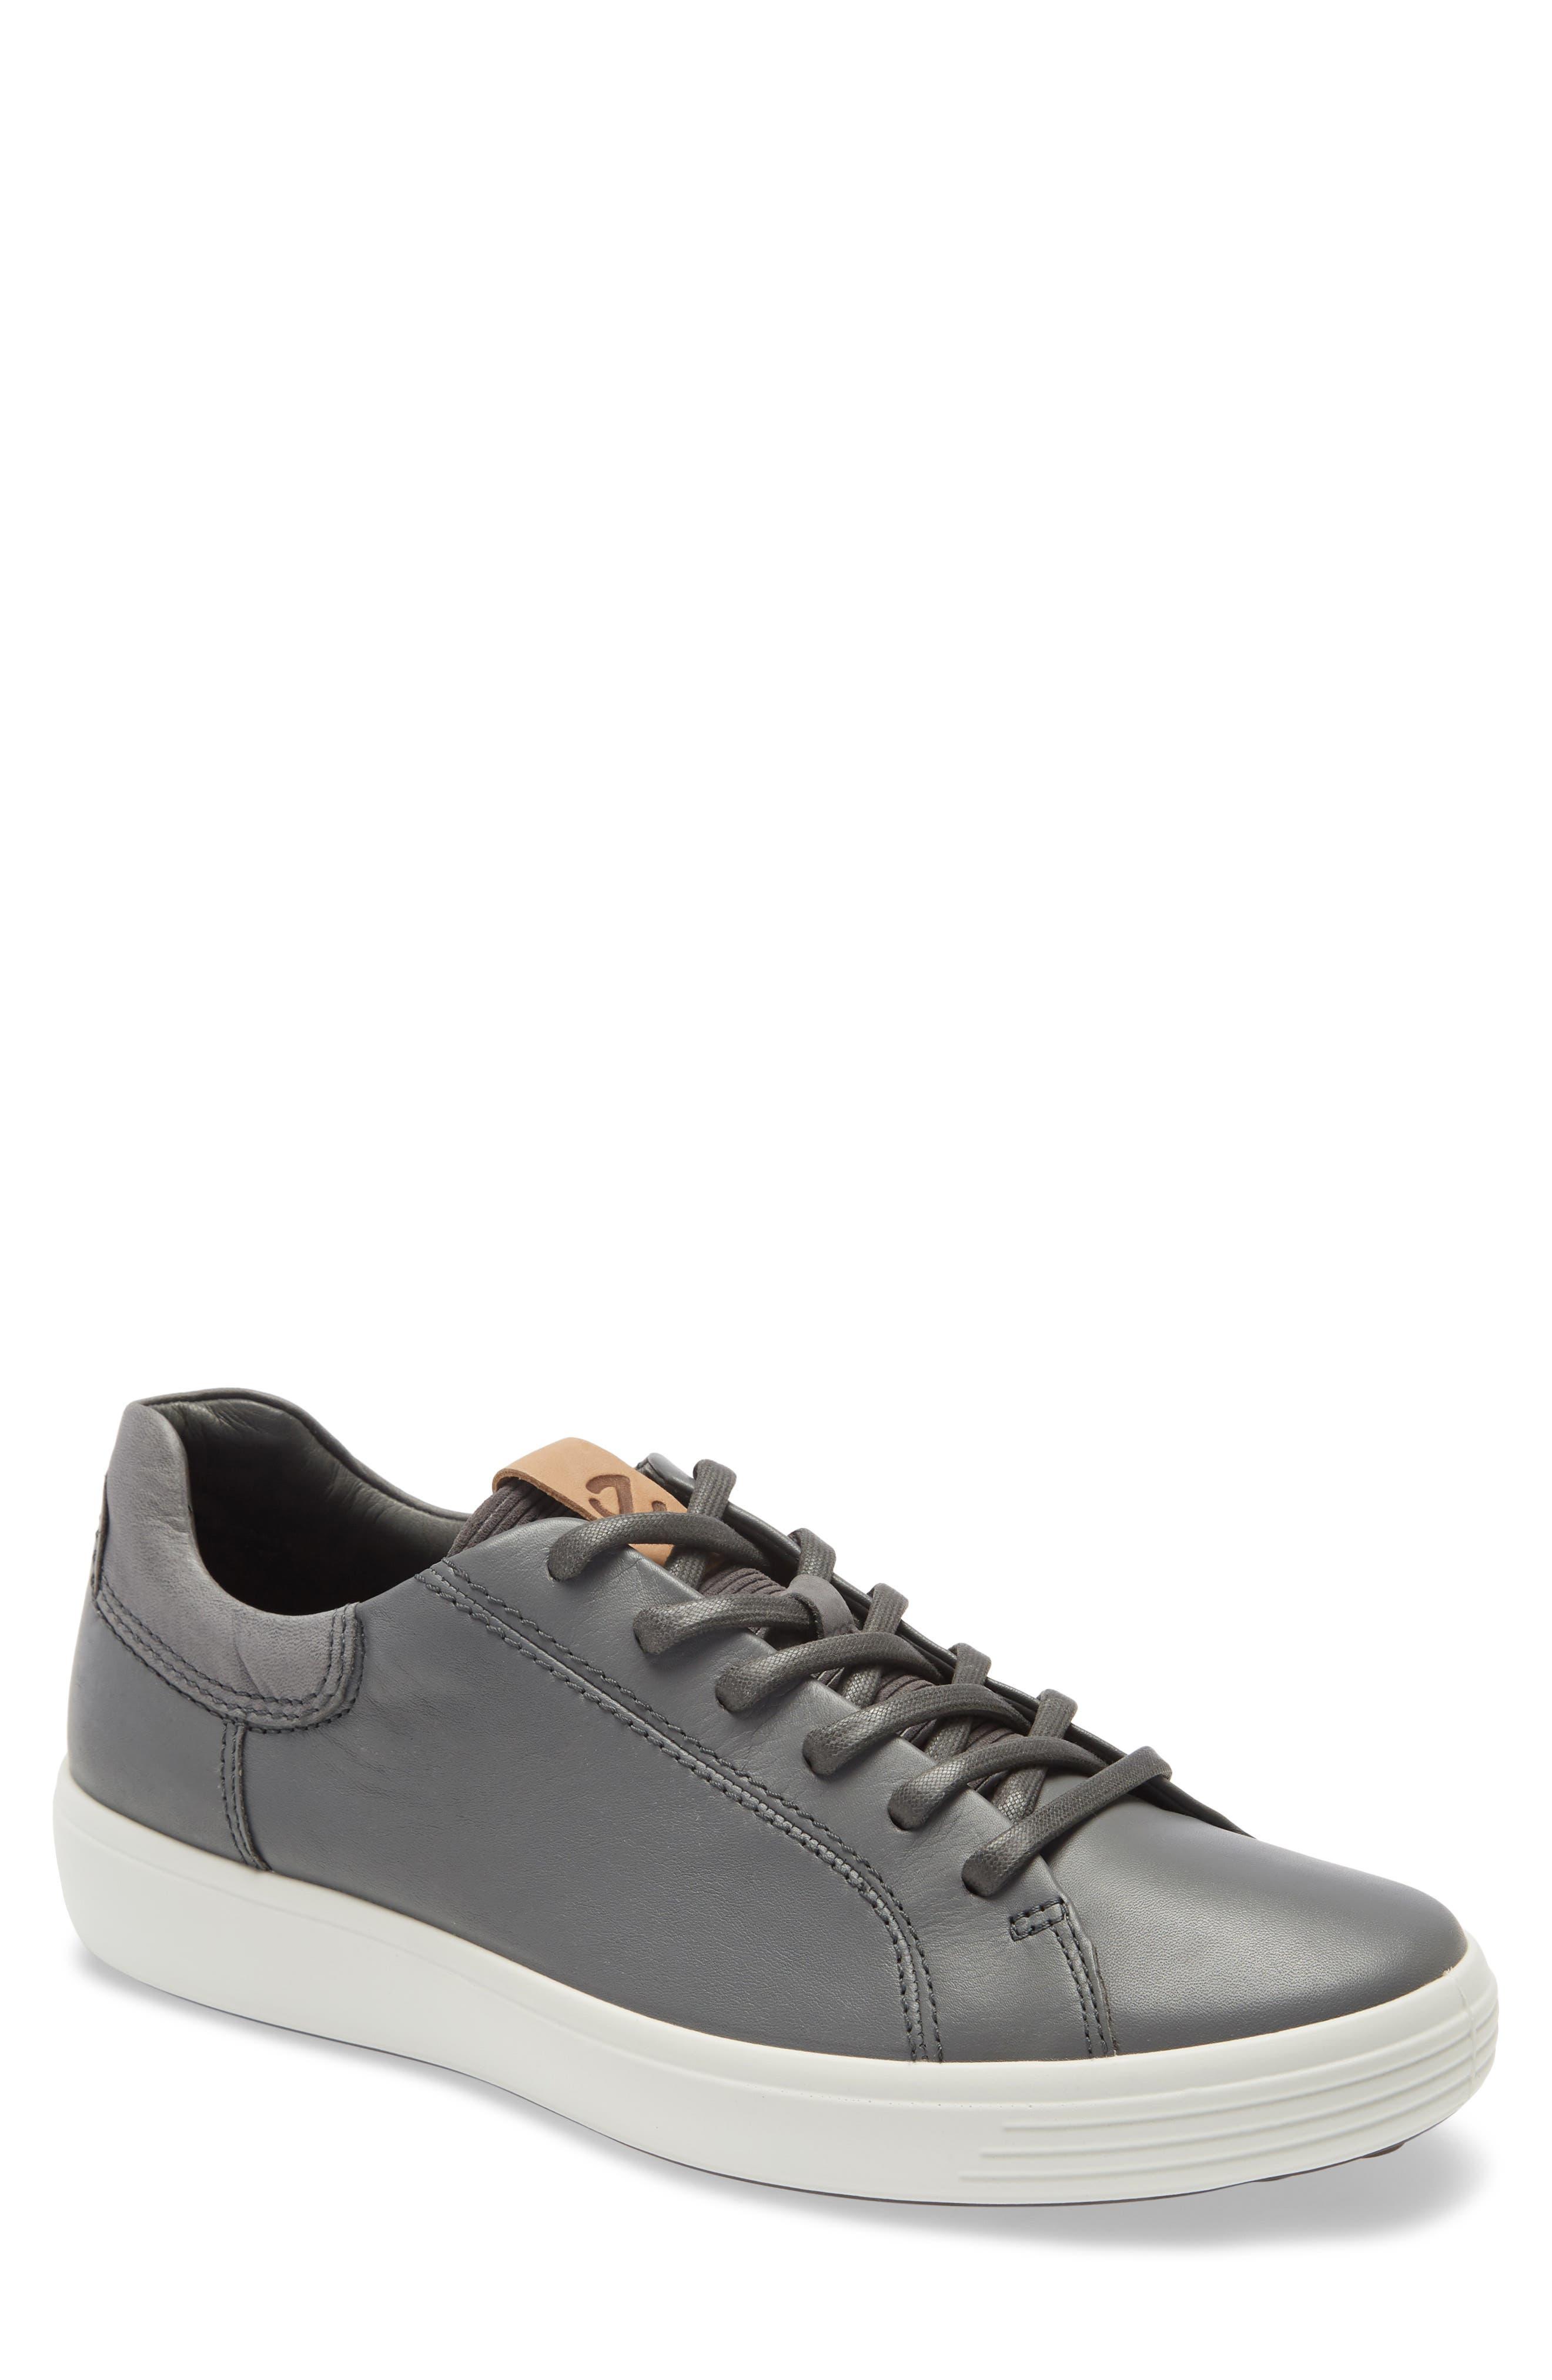 Men's Orthotic Friendly Comfort Shoes